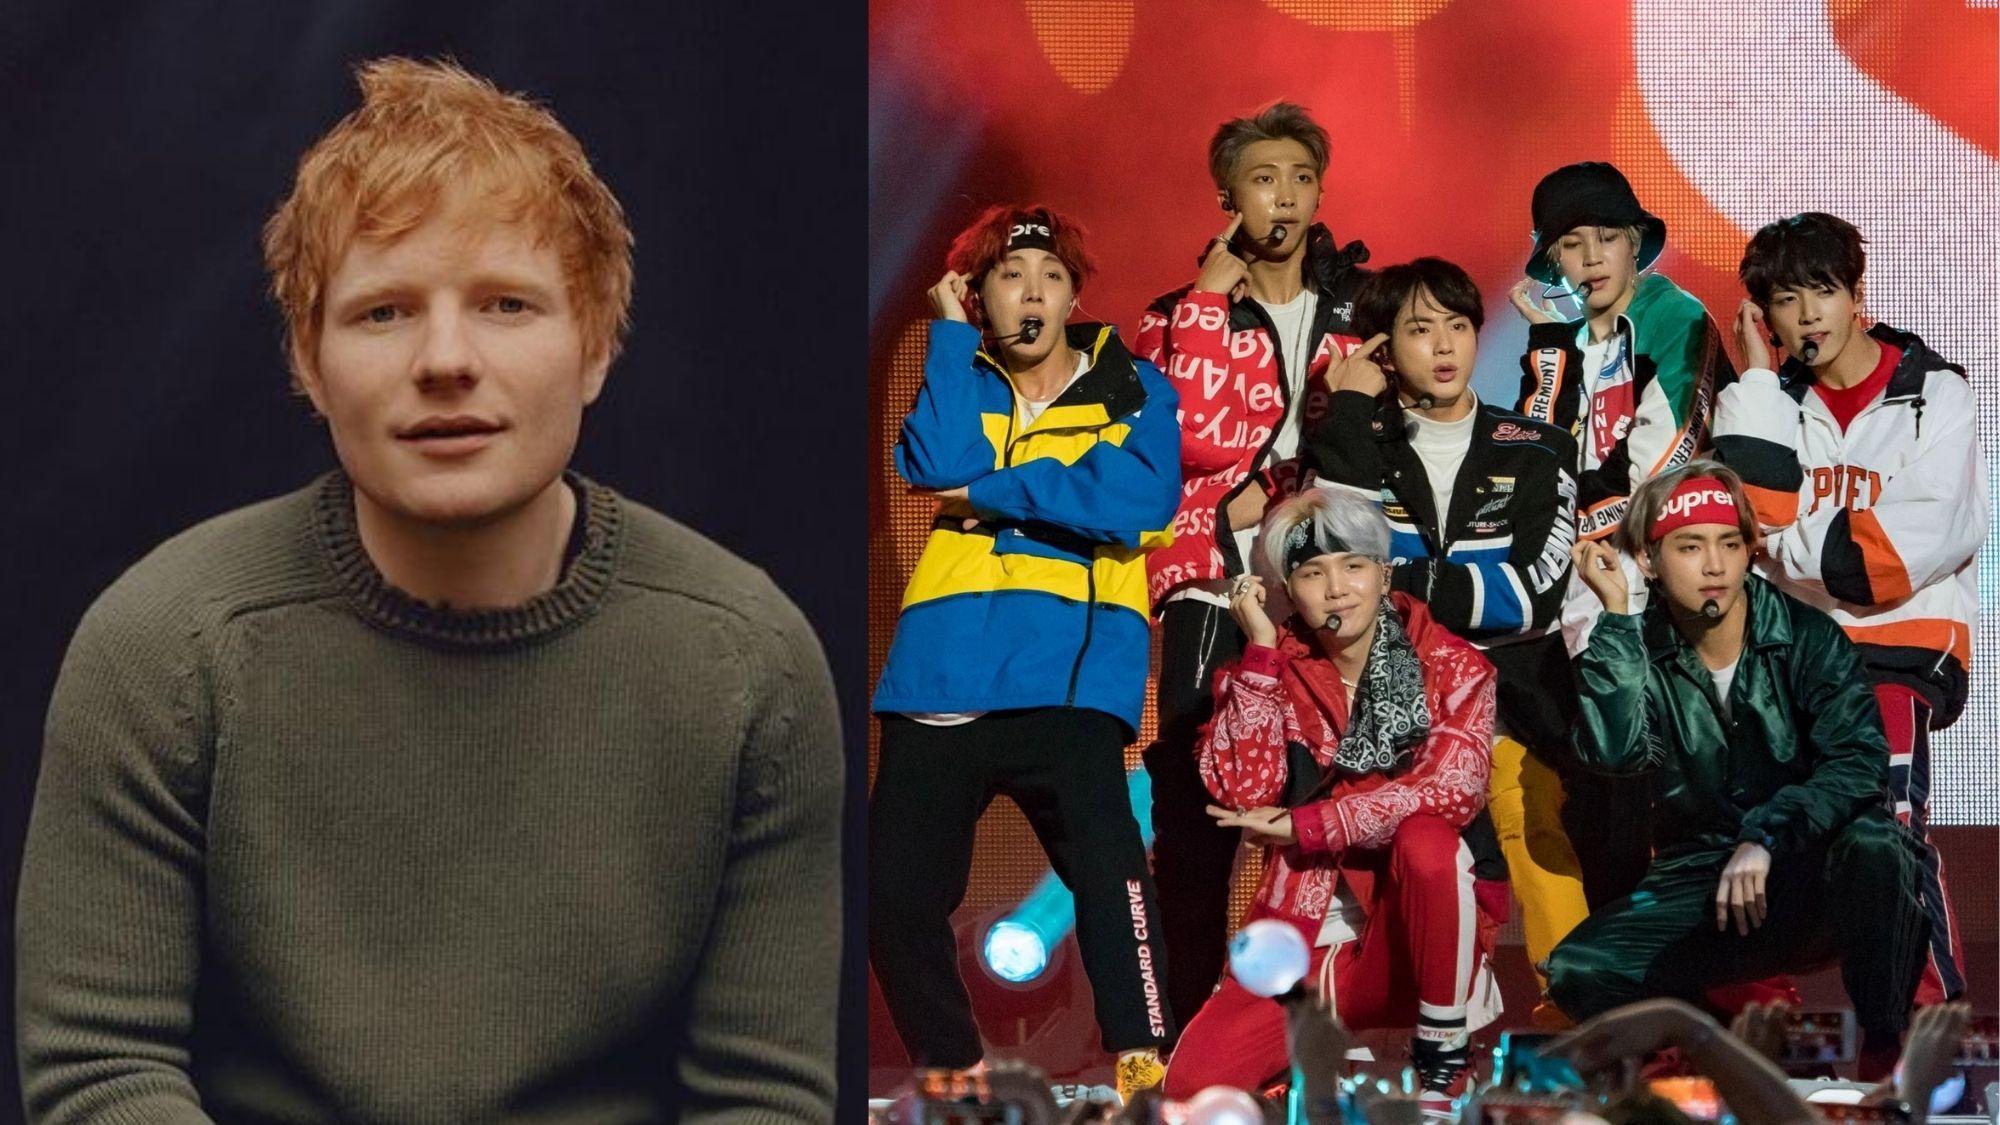 Ed Sheeran confirms another collab with KPop sensation BTS